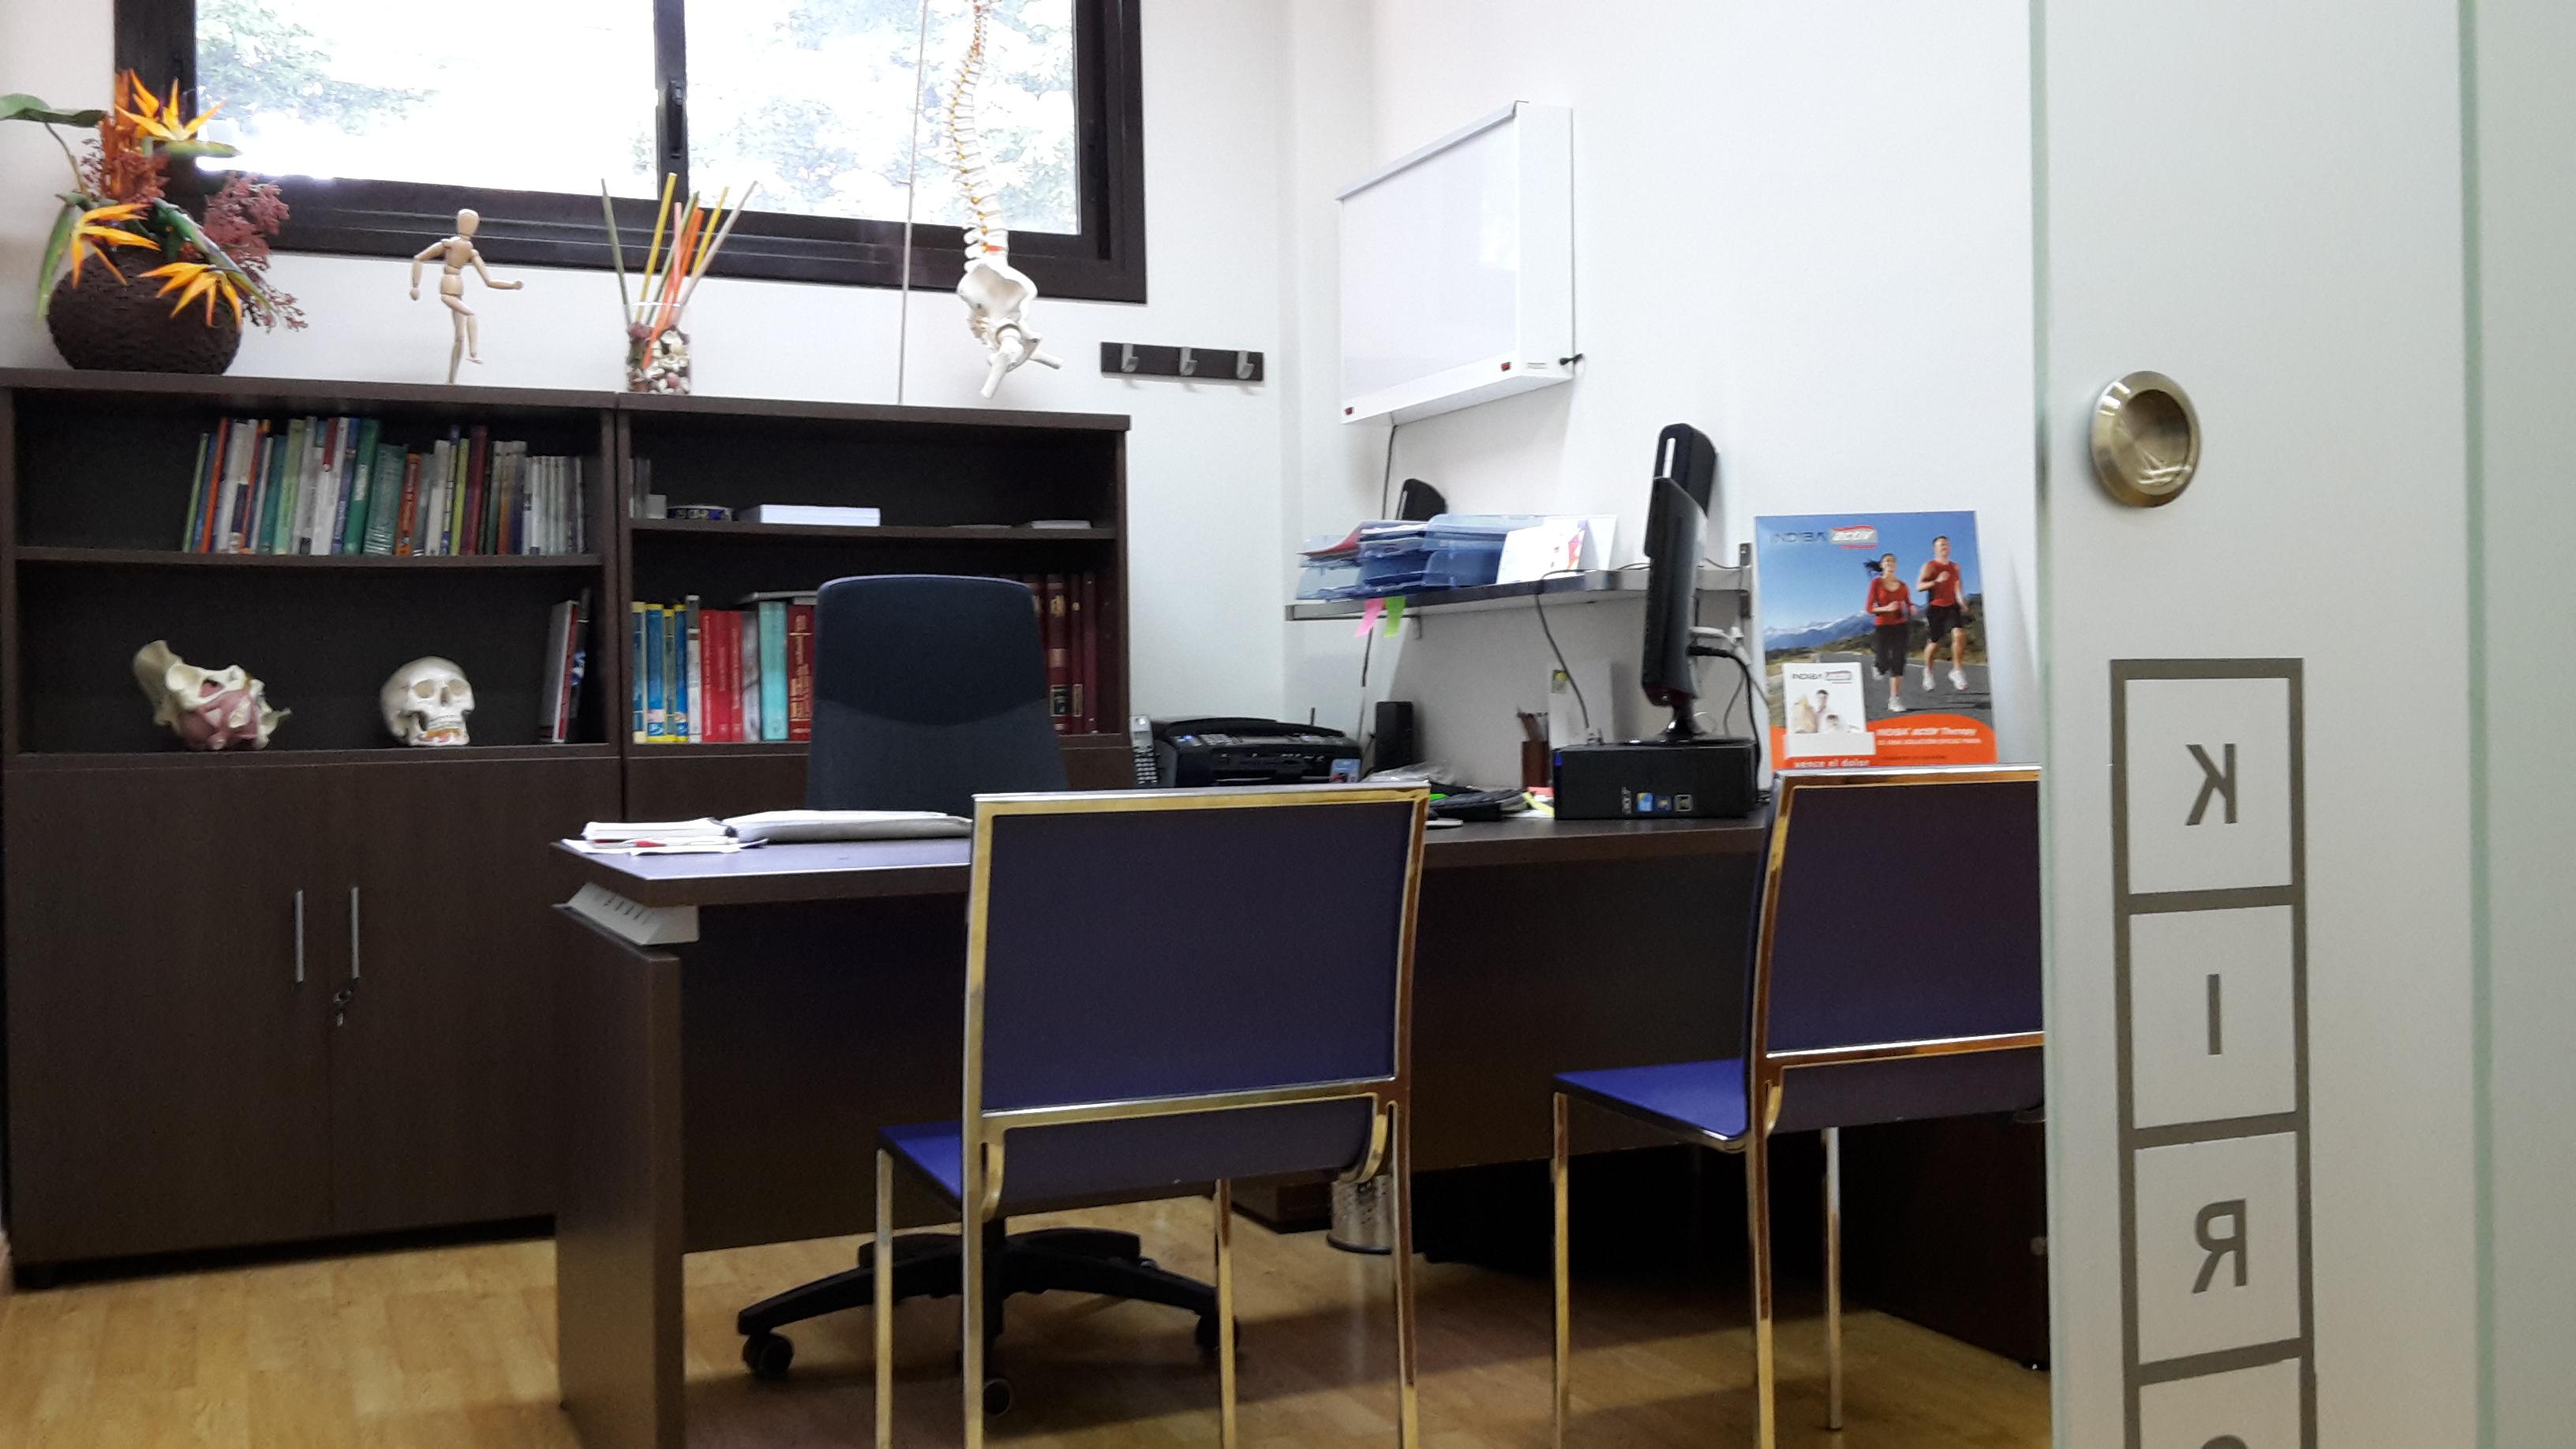 Kiro Fisioterapia Disfruta Ir N # Muebles Fisioterapia